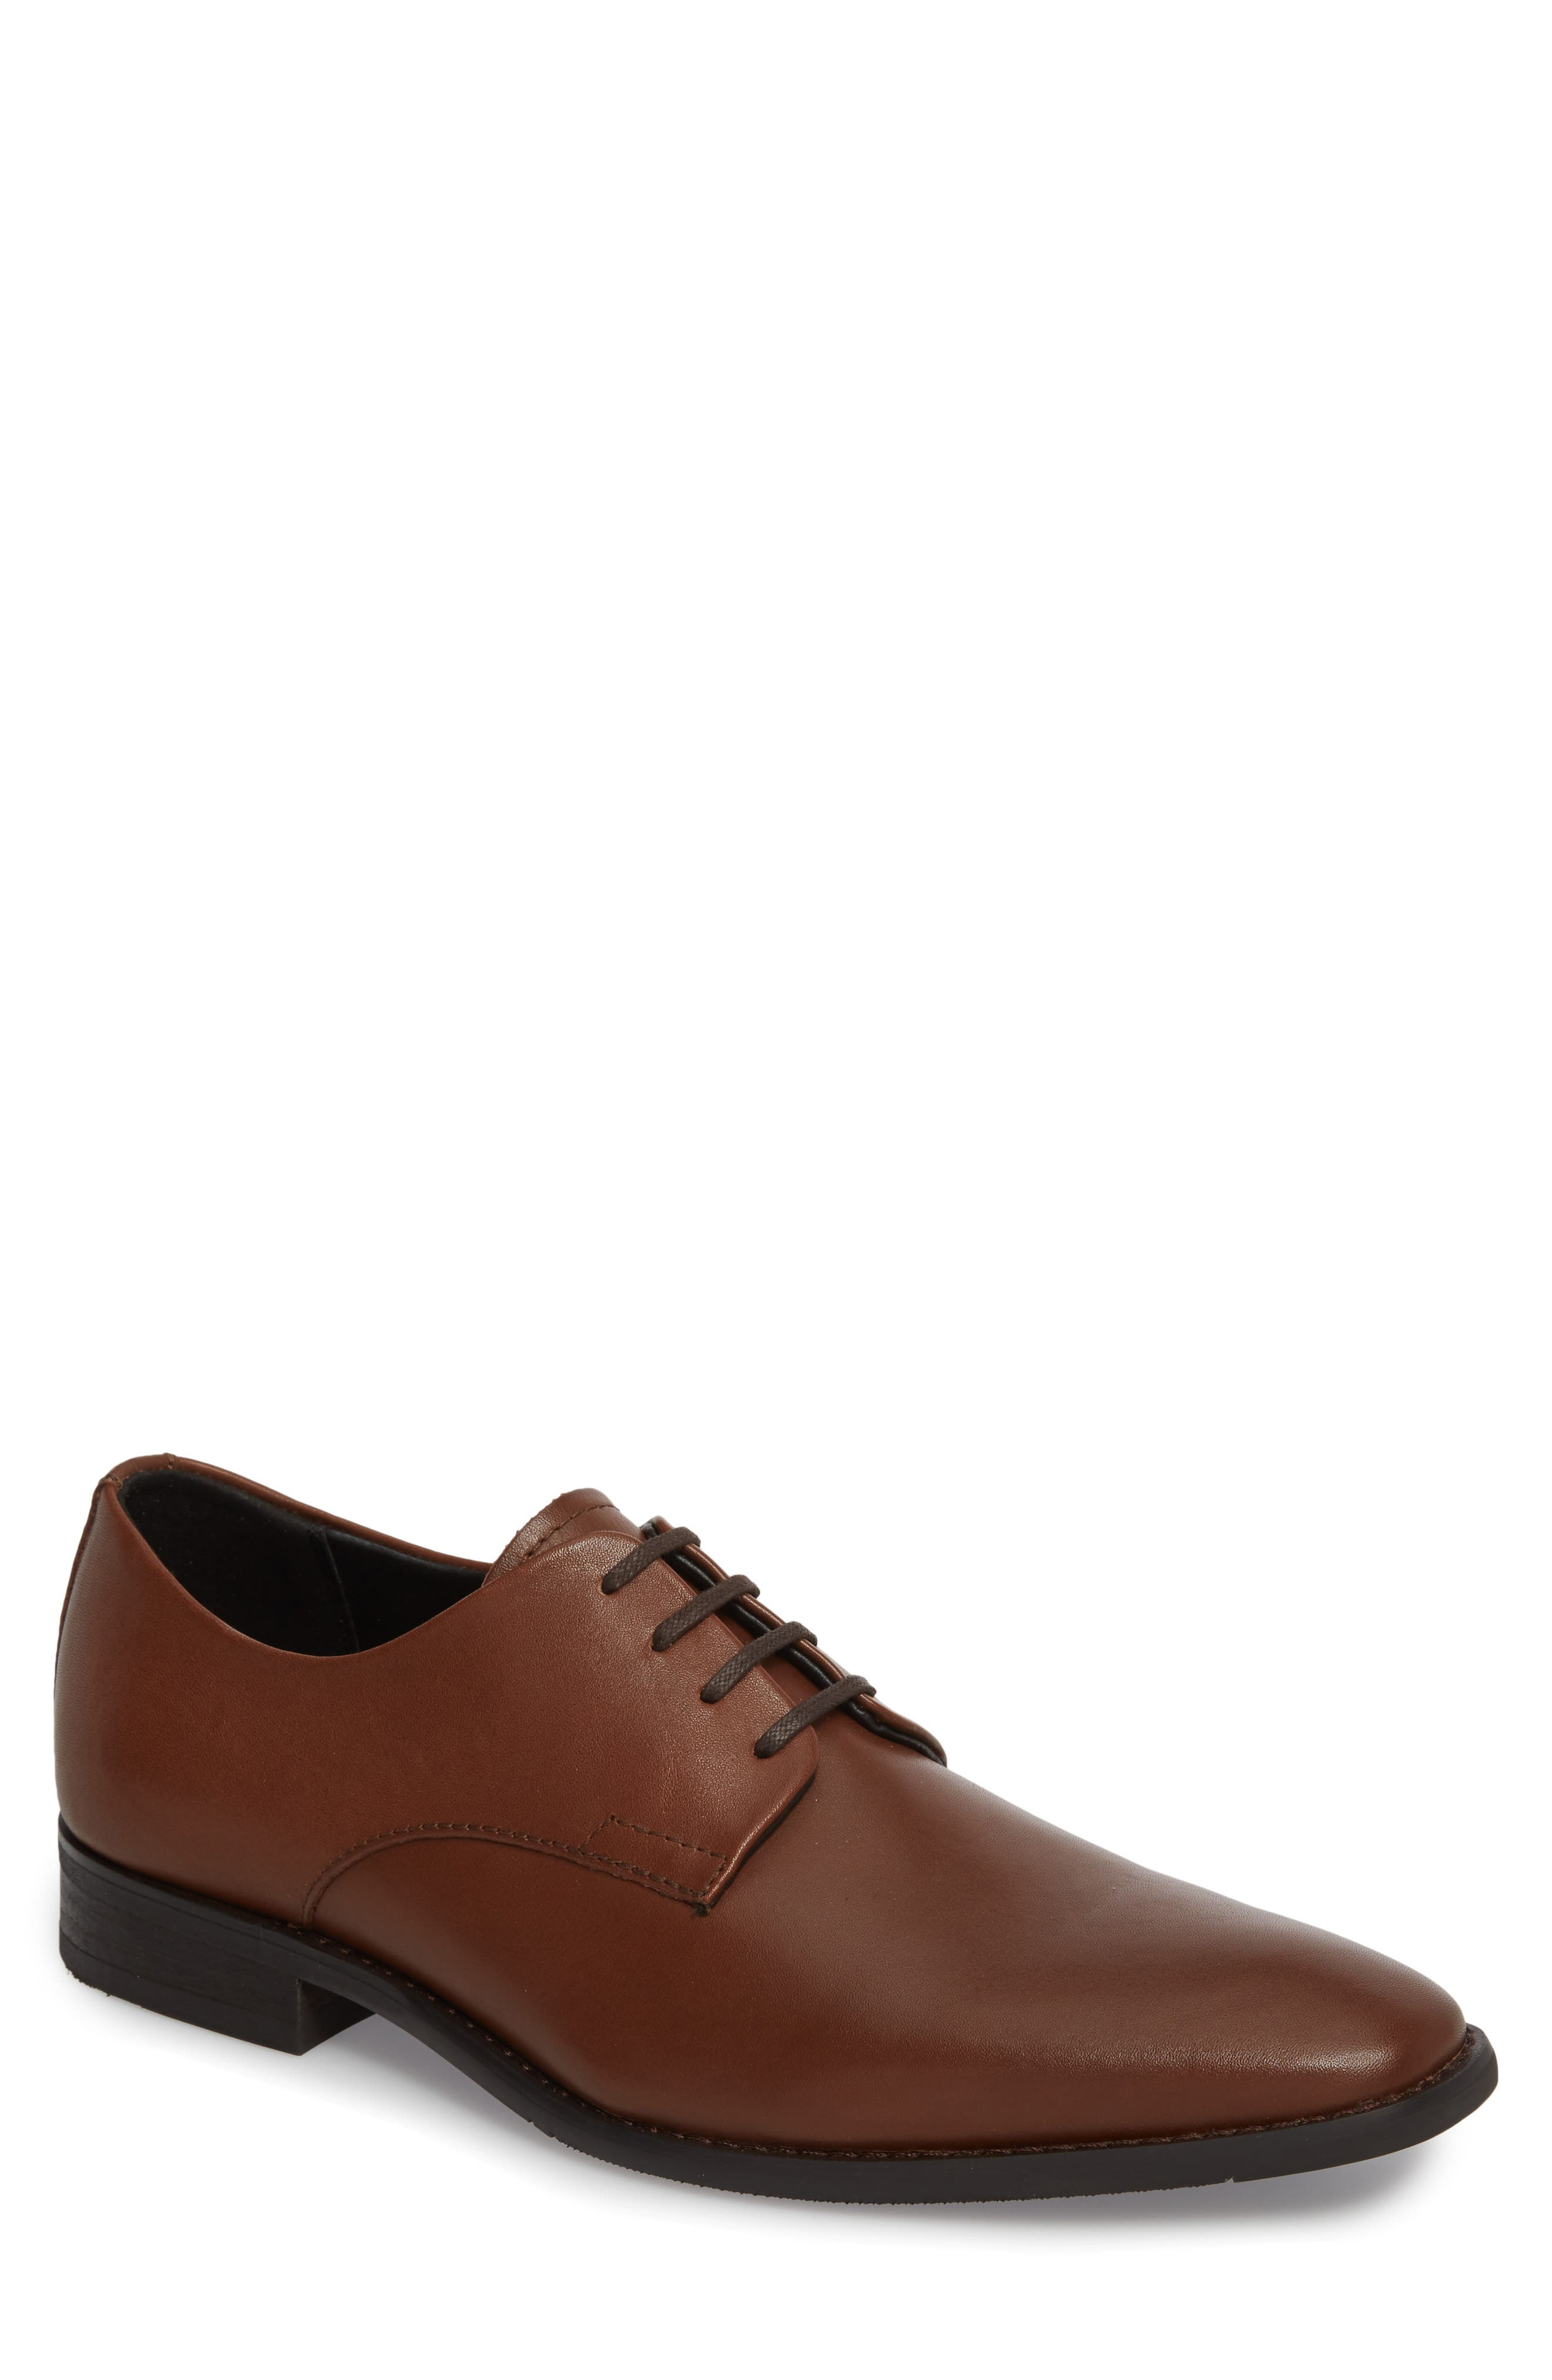 'Ramses' Plain Toe Derby,                             Main thumbnail 1, color,                             Tan Leather